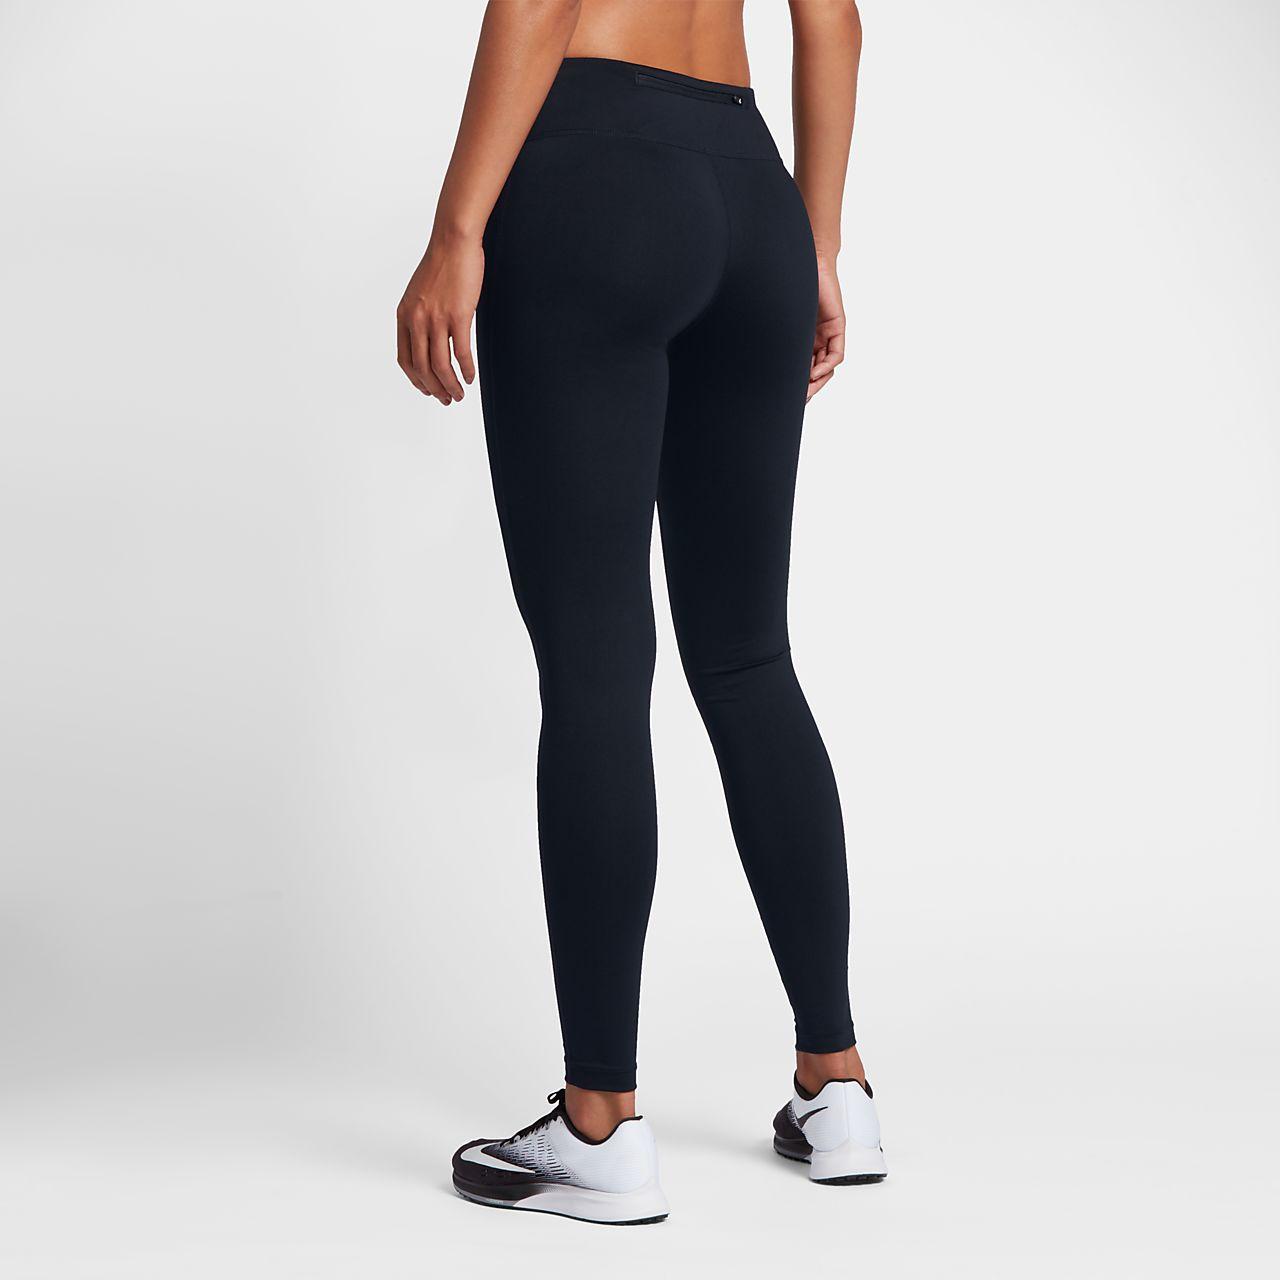 e538cf12297c Nike Essential Women s Mid-Rise Running Tights. Nike.com GB